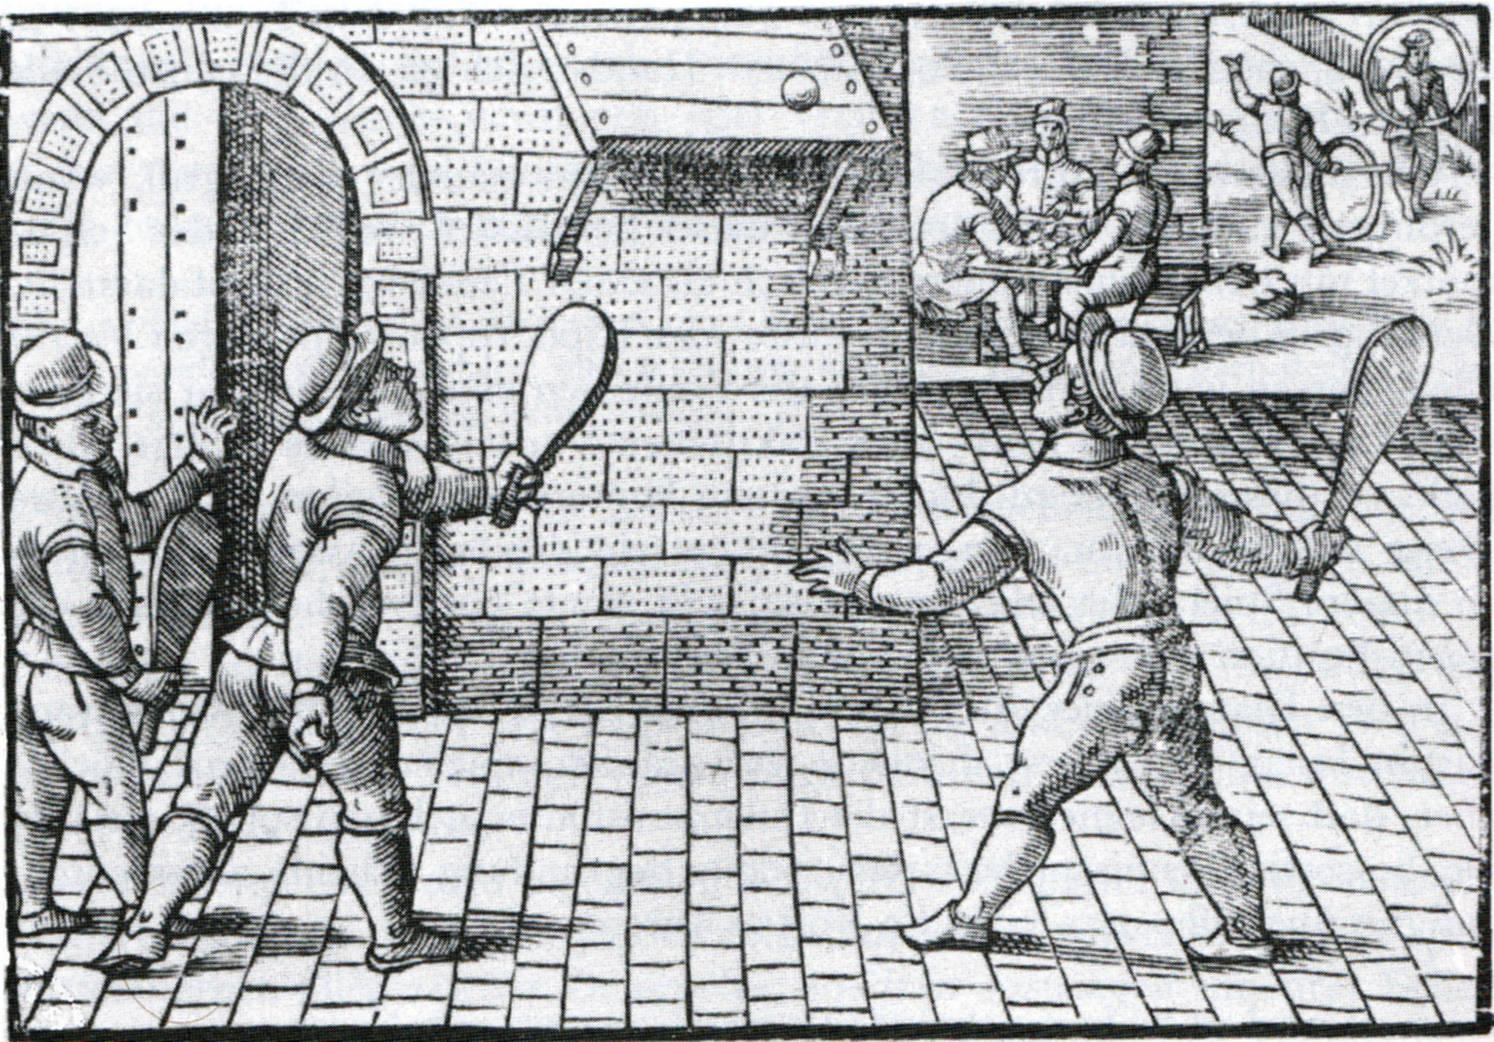 Tennis_in_France,_16th_century.jpg